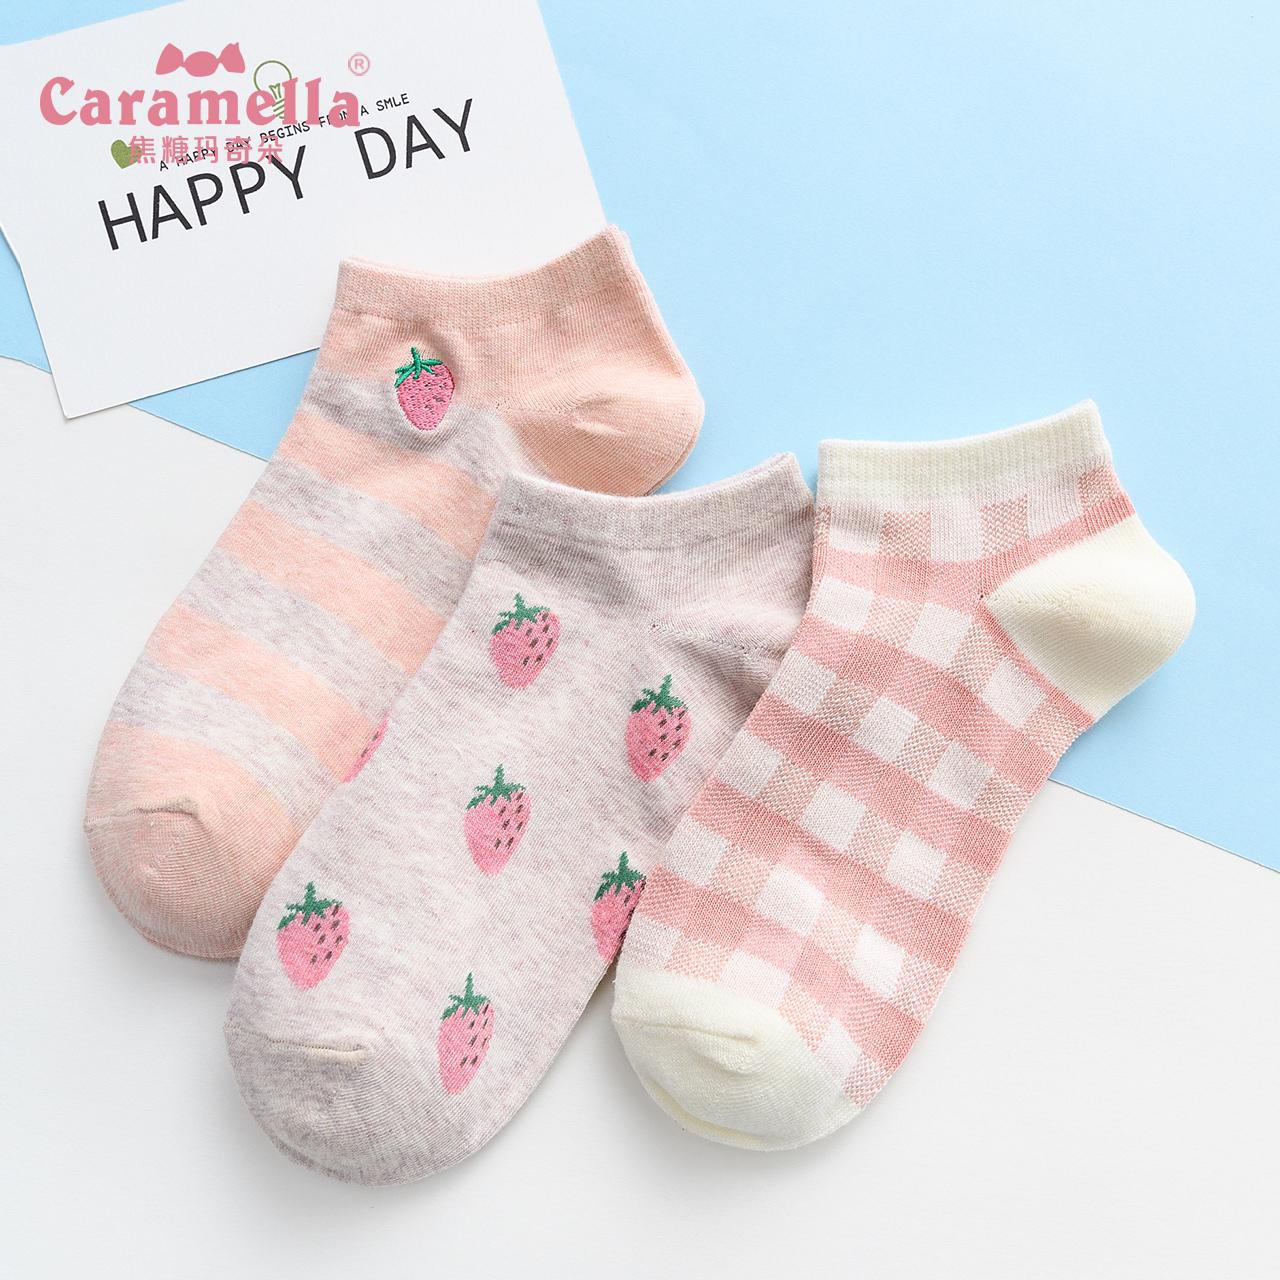 CARAMELLA袜子女短袜浅口春秋士棉袜船袜可爱日系隐形袜ins潮薄款